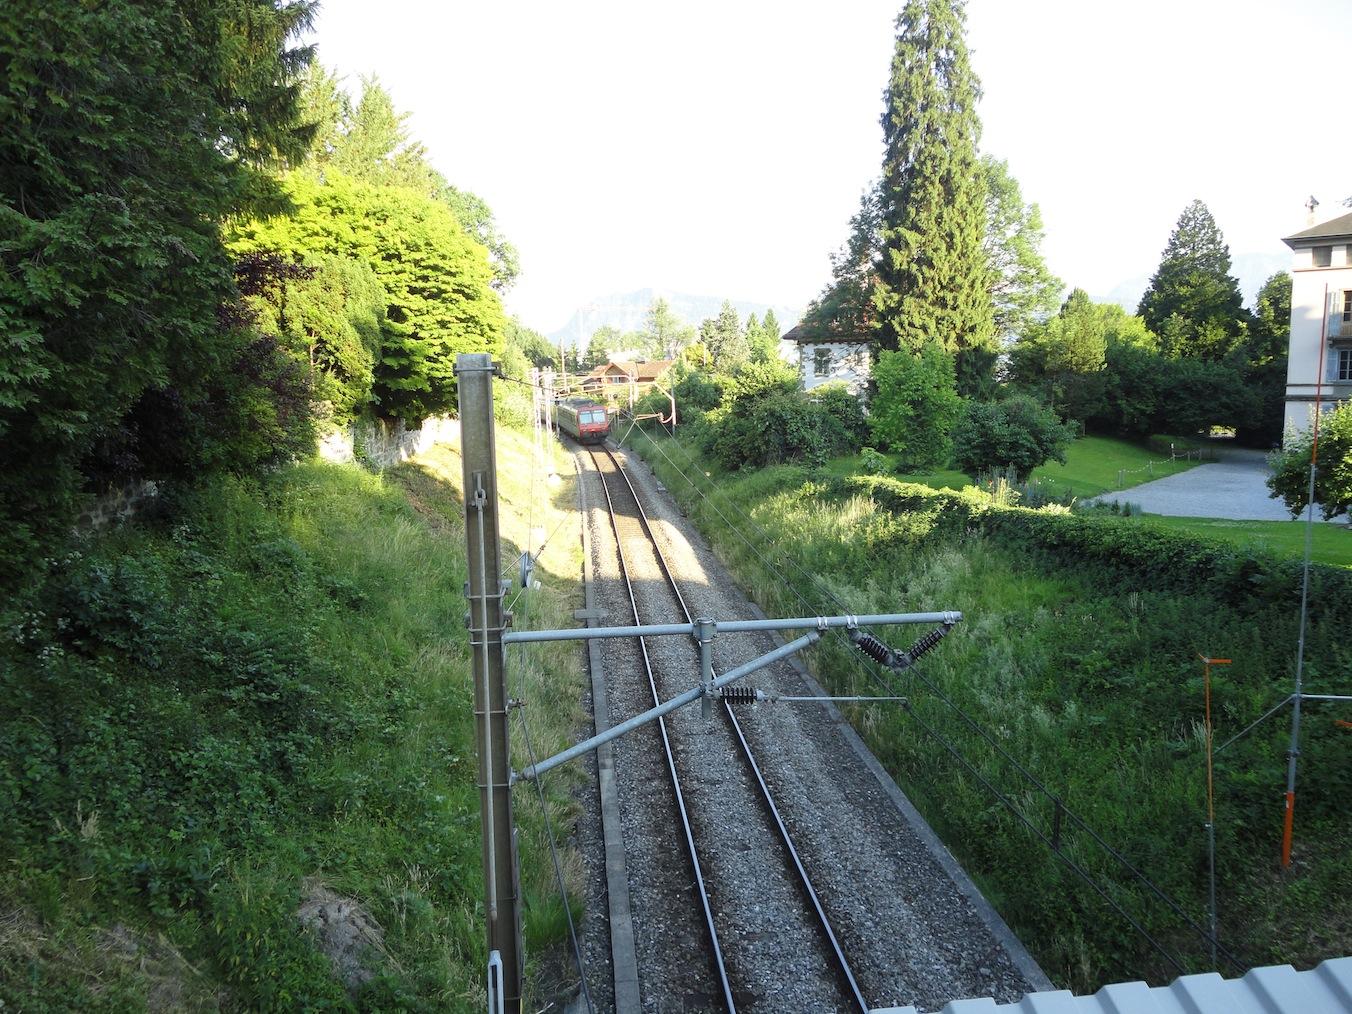 Zugfahrt zum Stadttunnel